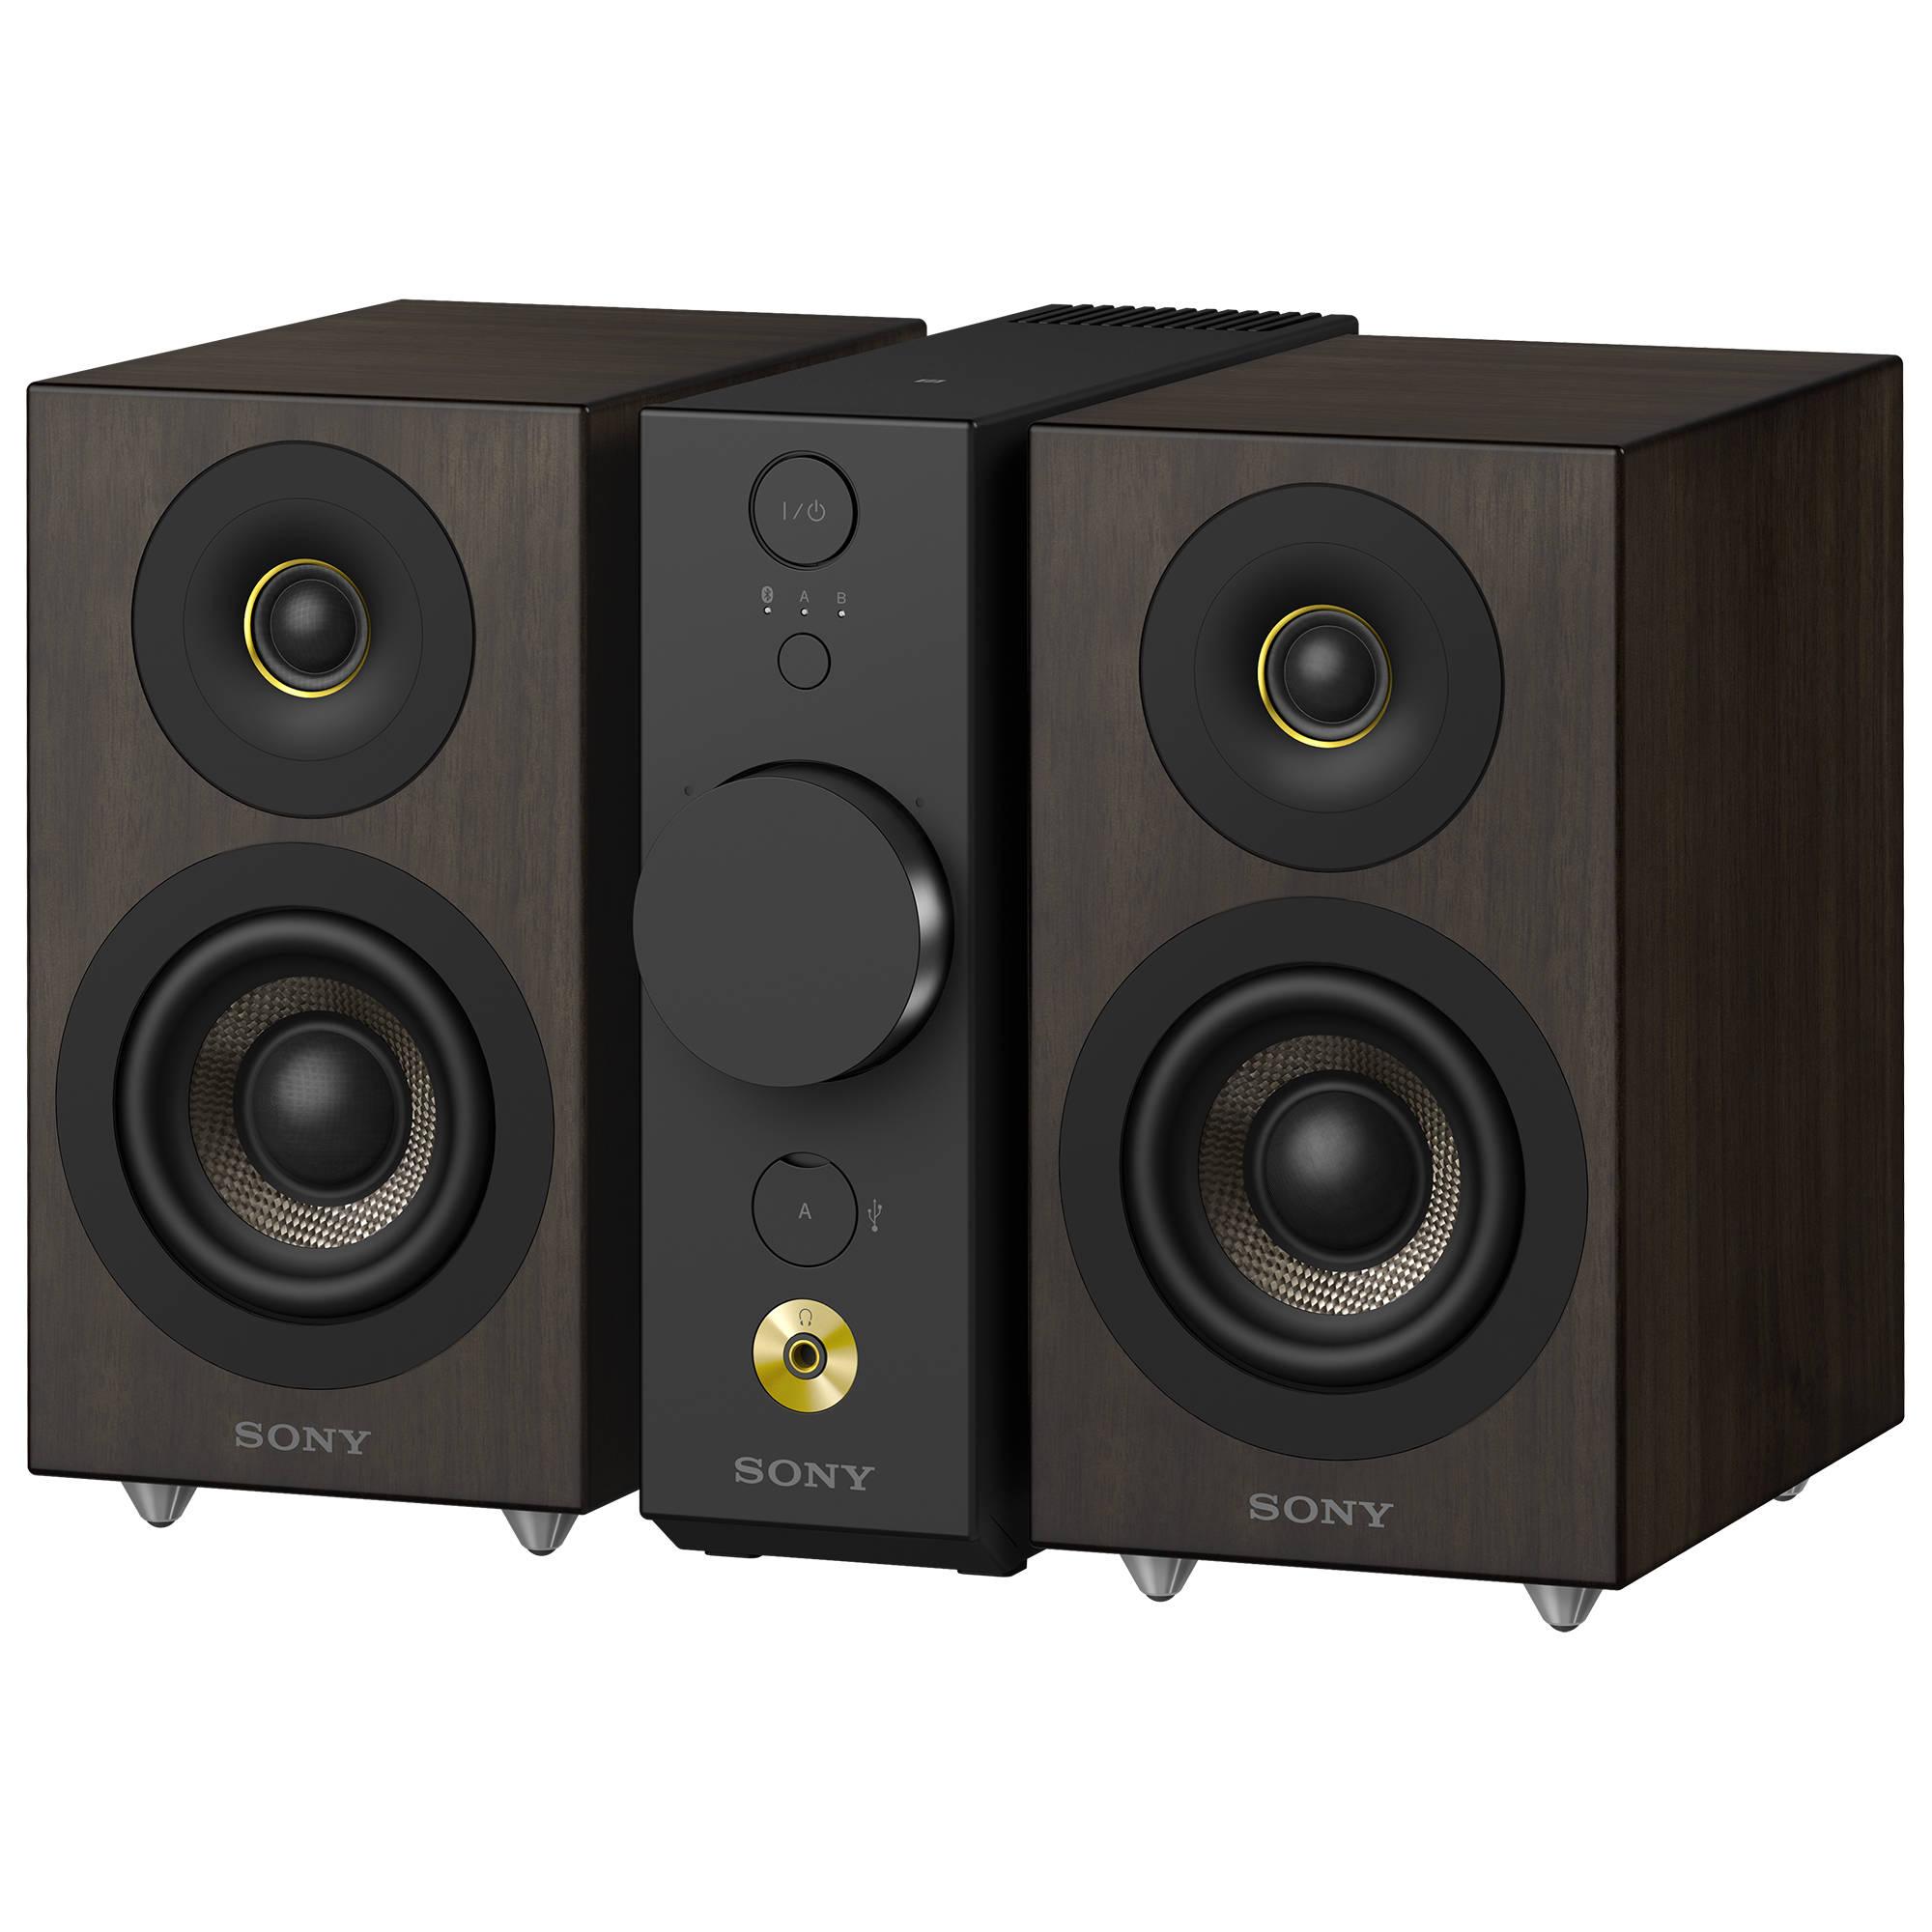 Sony CAS-1 High-Resolution Desktop Audio System with Headphone Amplifier